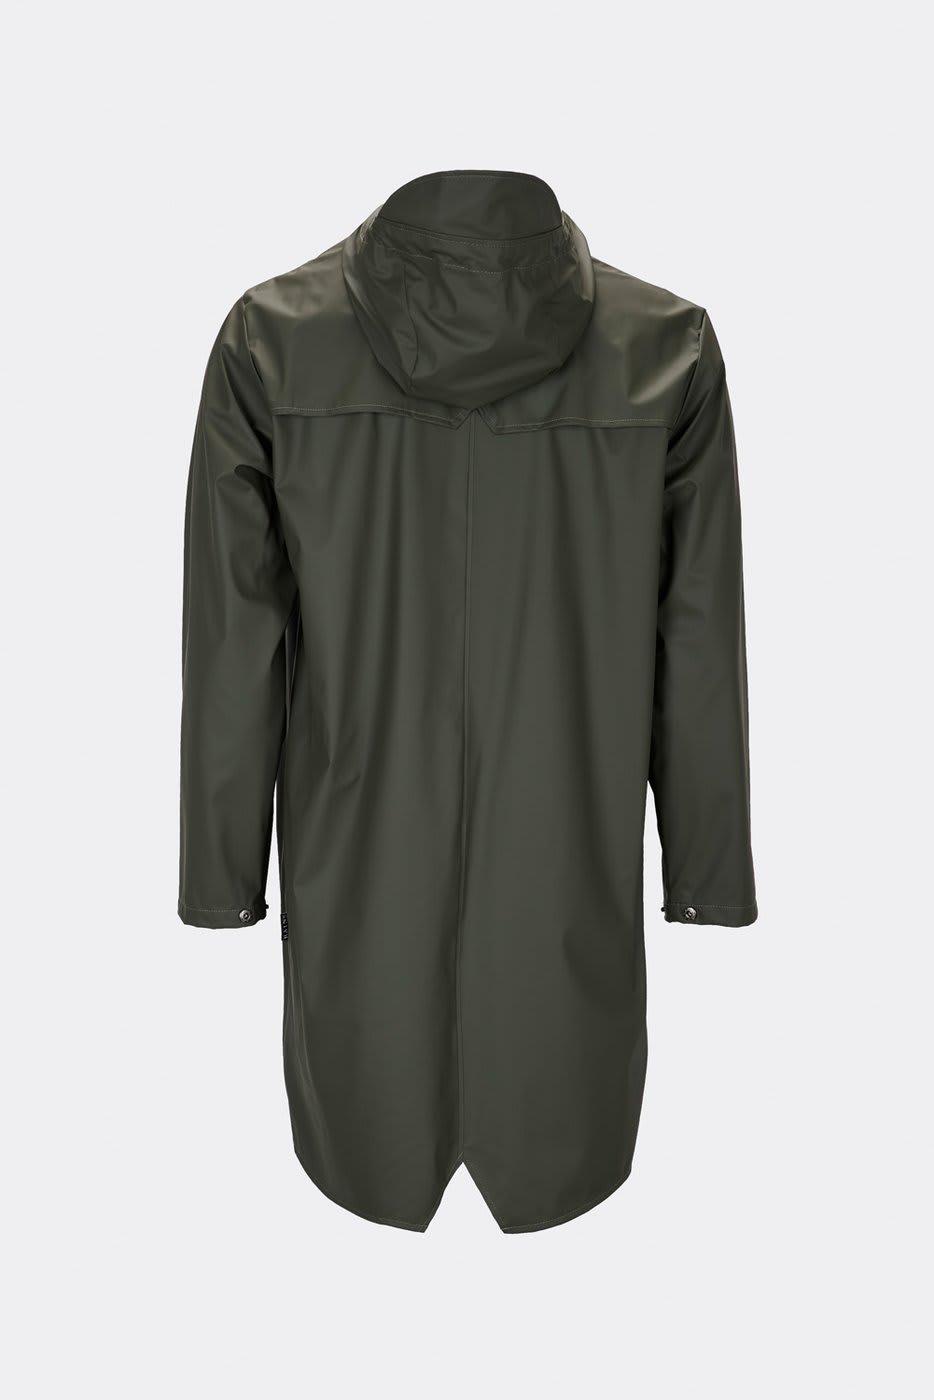 Rains Green Long Jacket